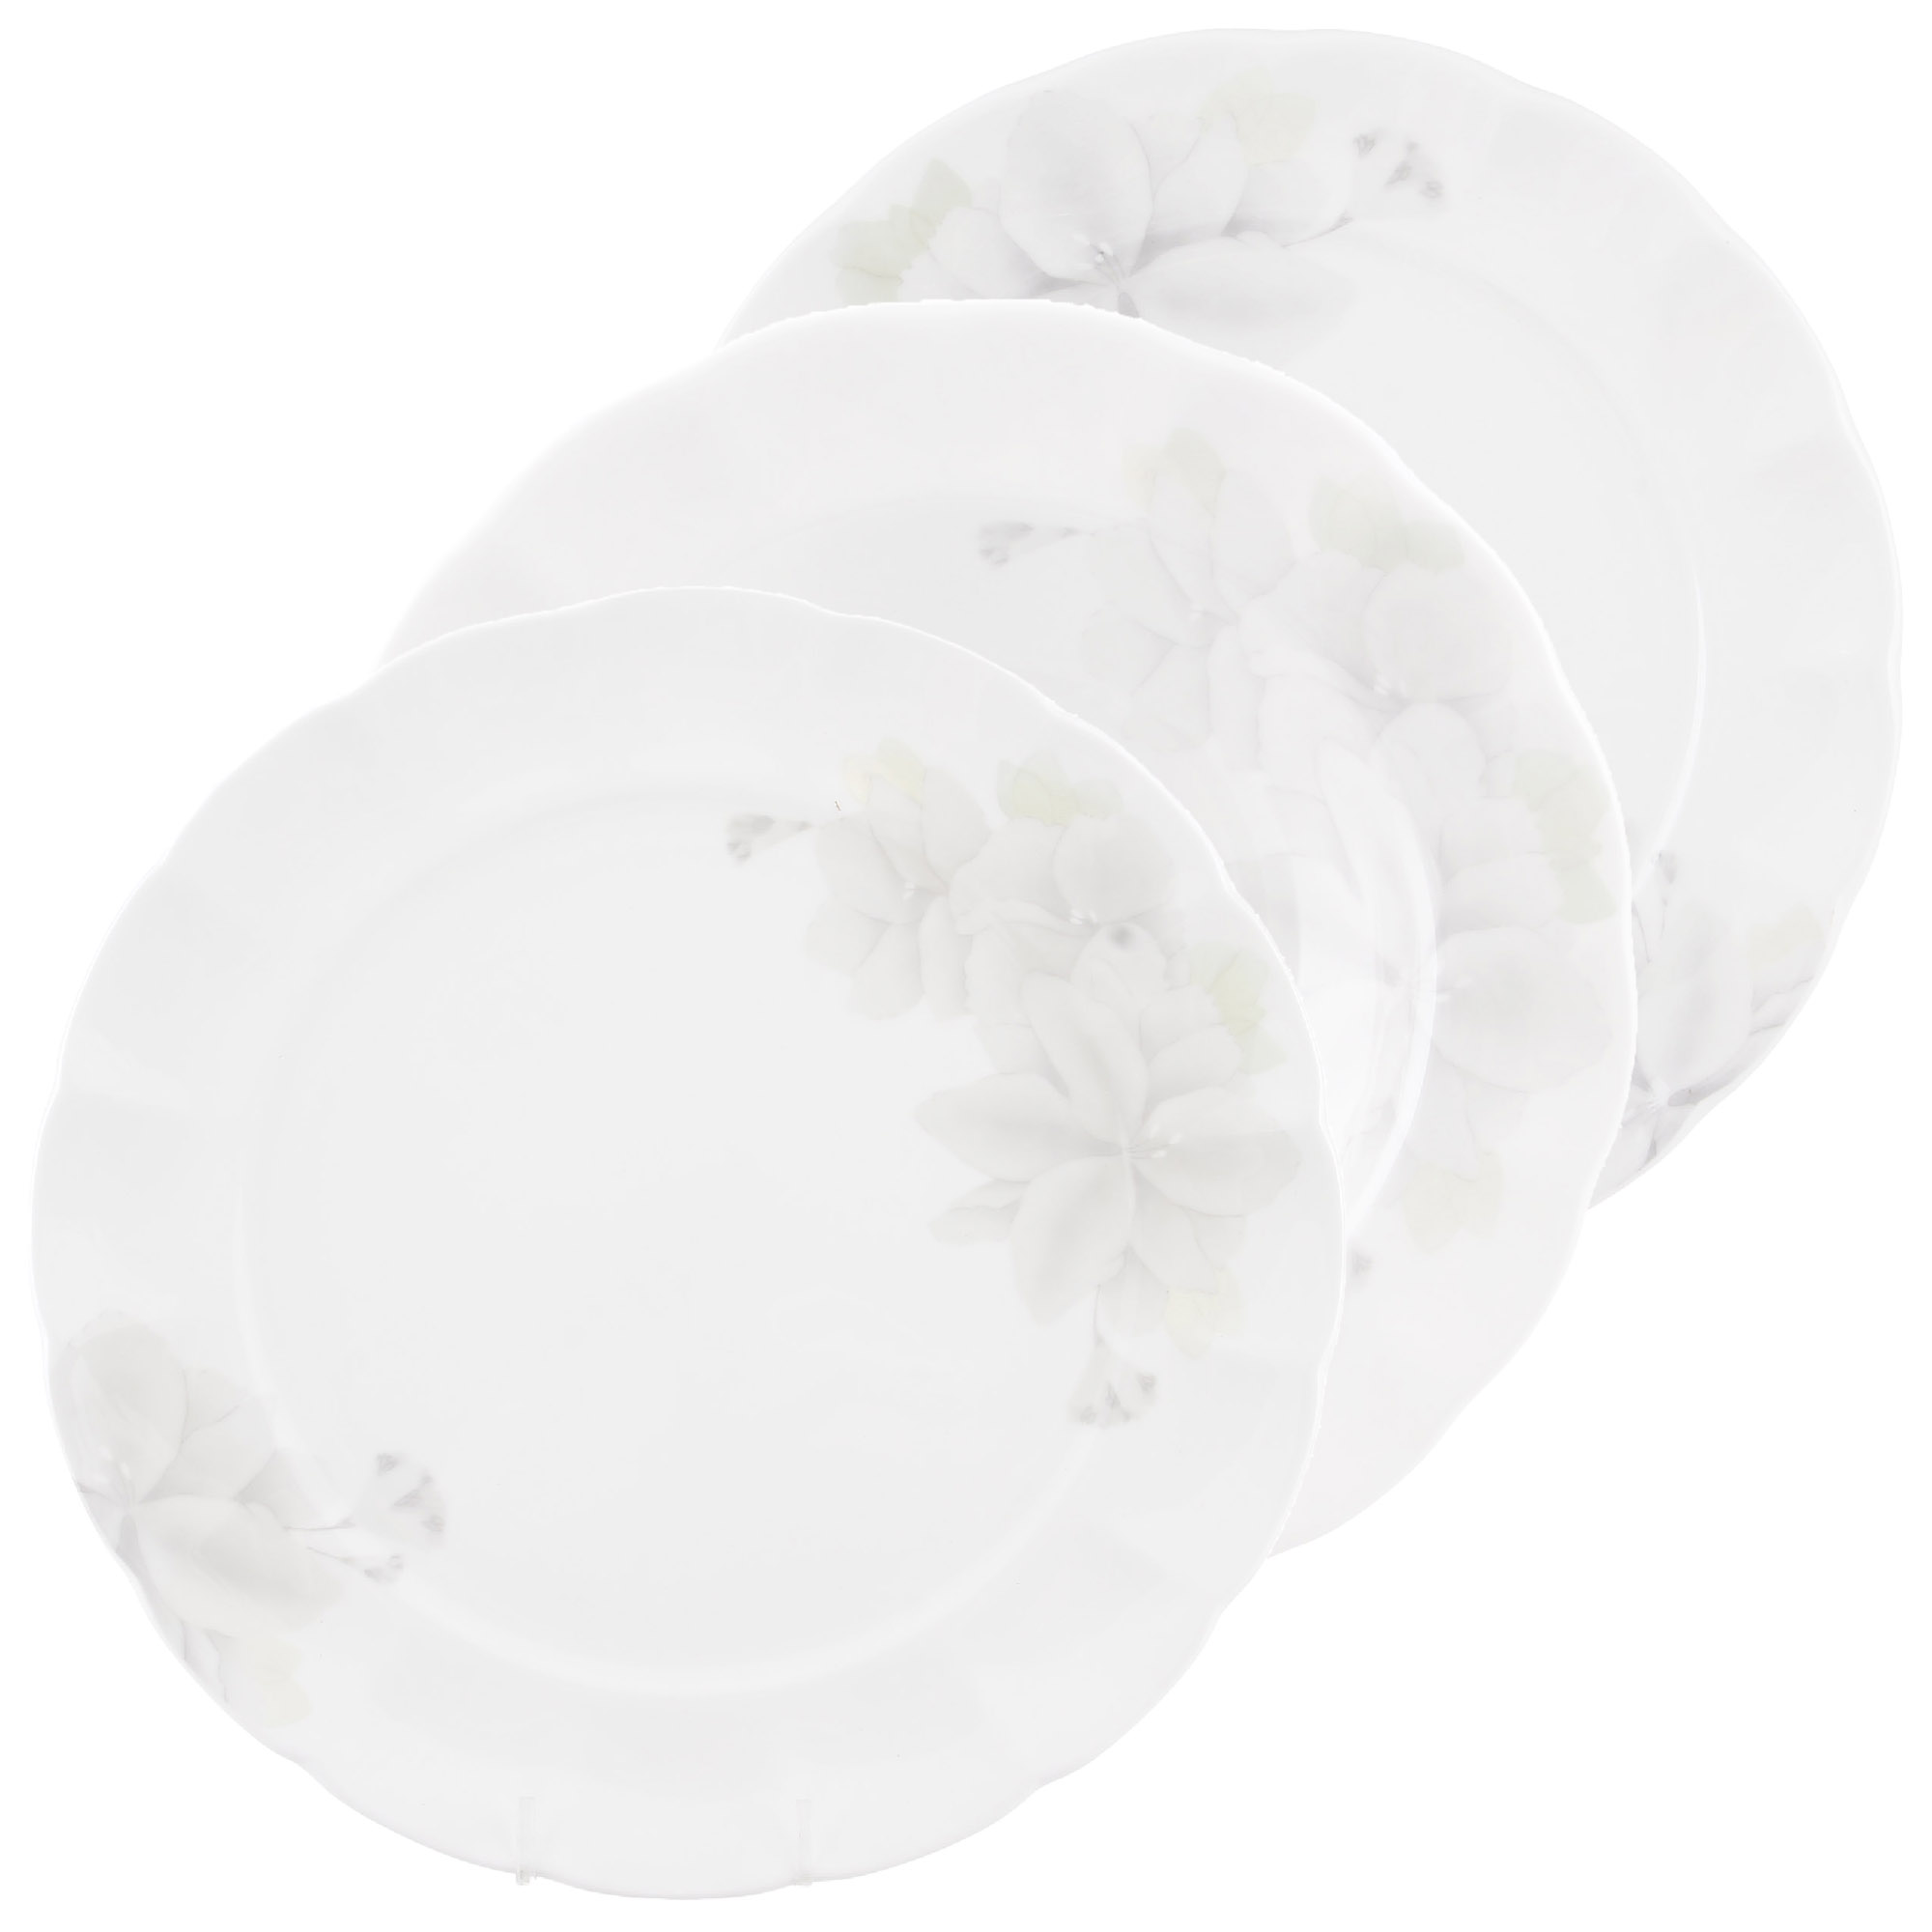 Набор тарелок Hatori грэй 18 предметов 6 персон фото